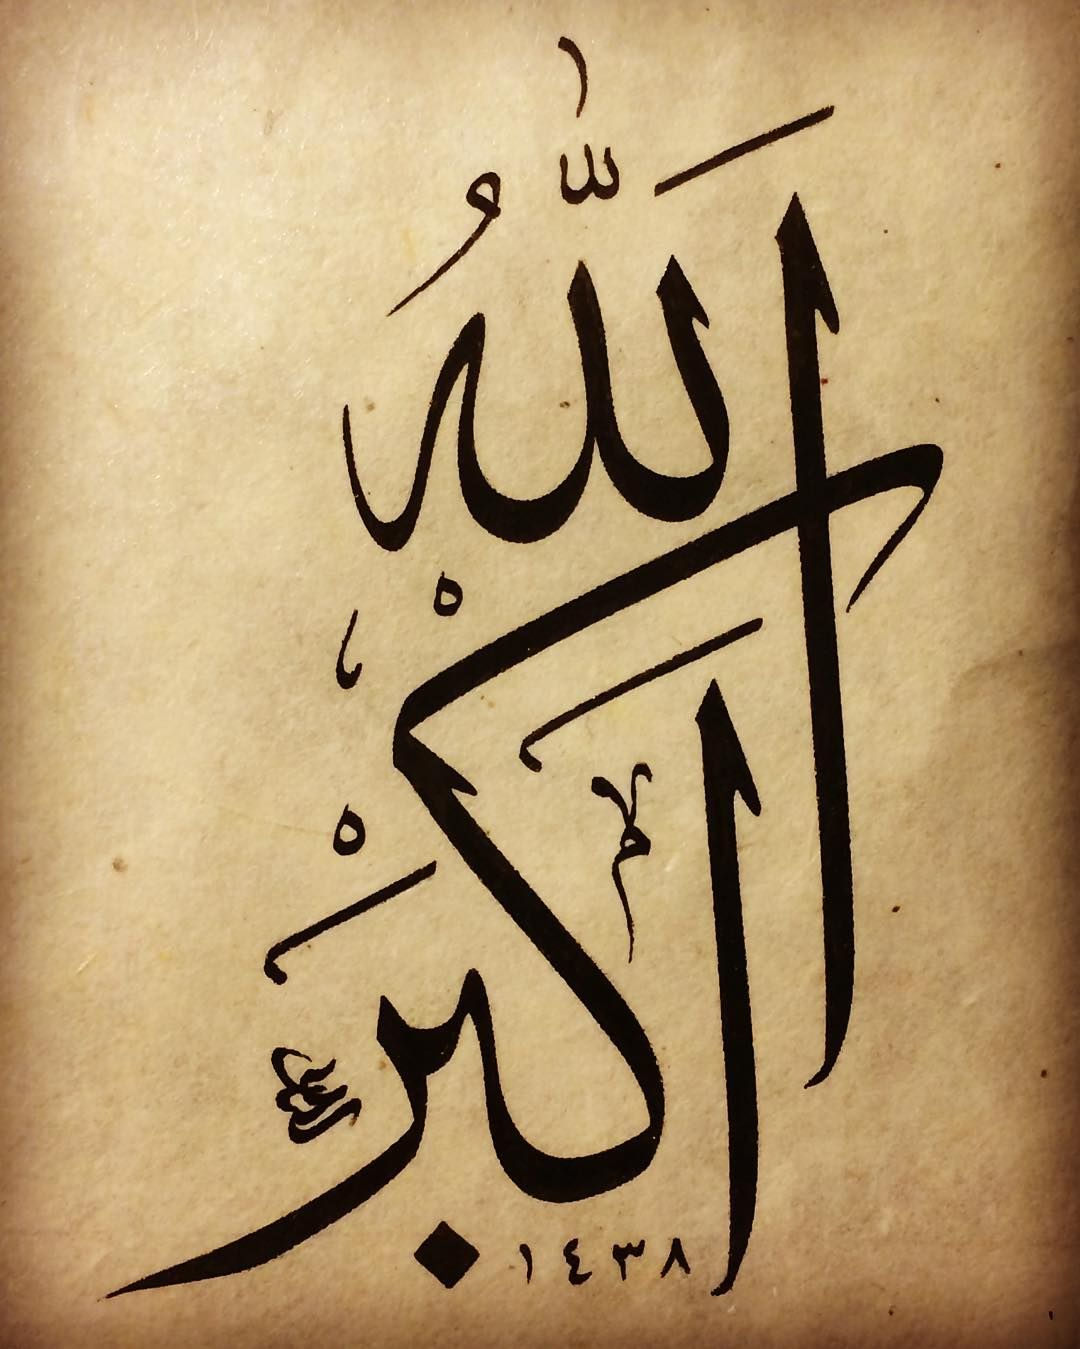 Allahu Ekber Islamicart Artwork Calligraphy Sanat Hatsanati Husnuhat Hattat Illumination Tezhip Sulus Arapca Kaligrafi Sanati Yazi Sanati Hat Sanati